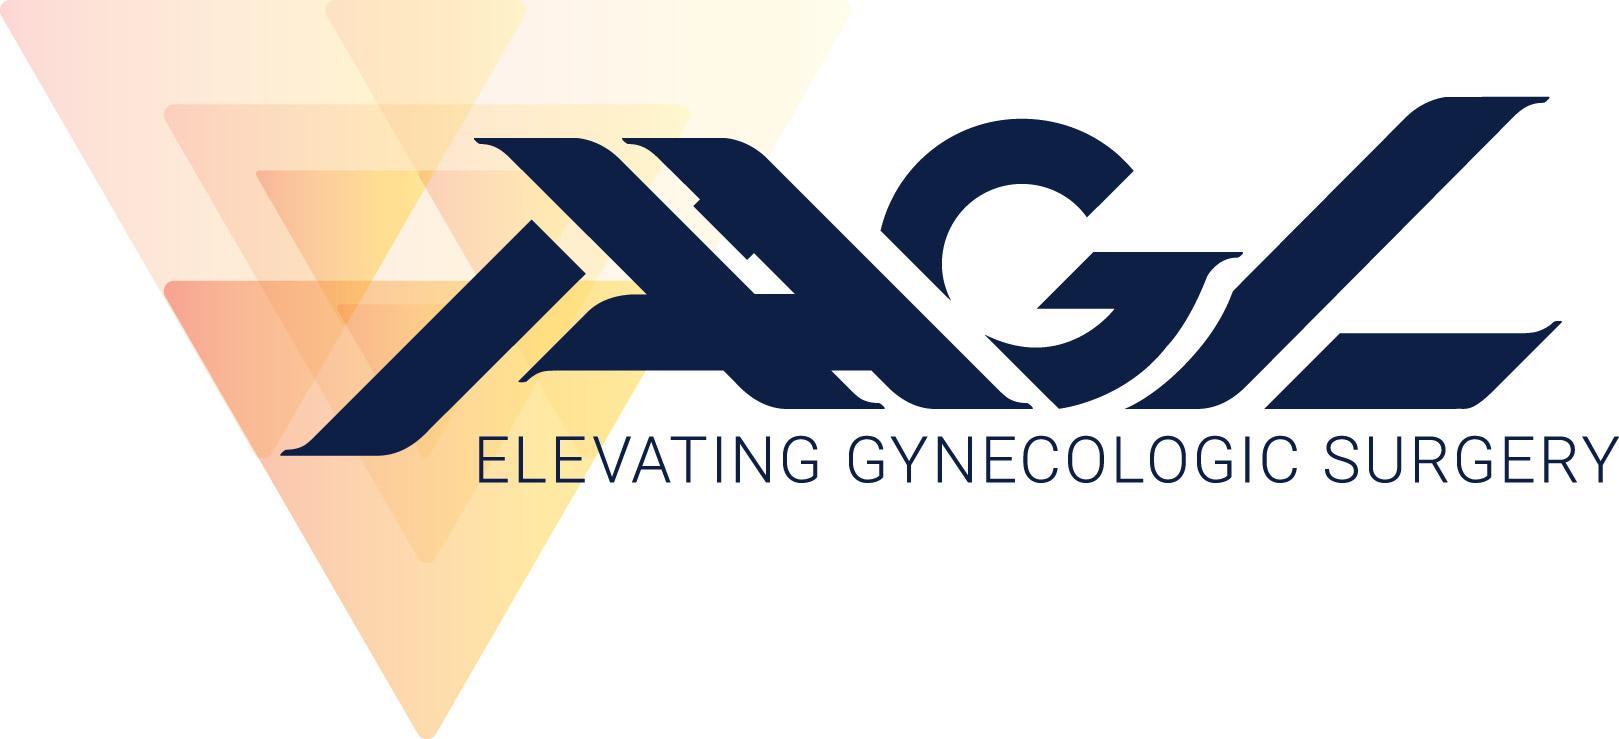 IGCS   International Gynecologic Cancer Society